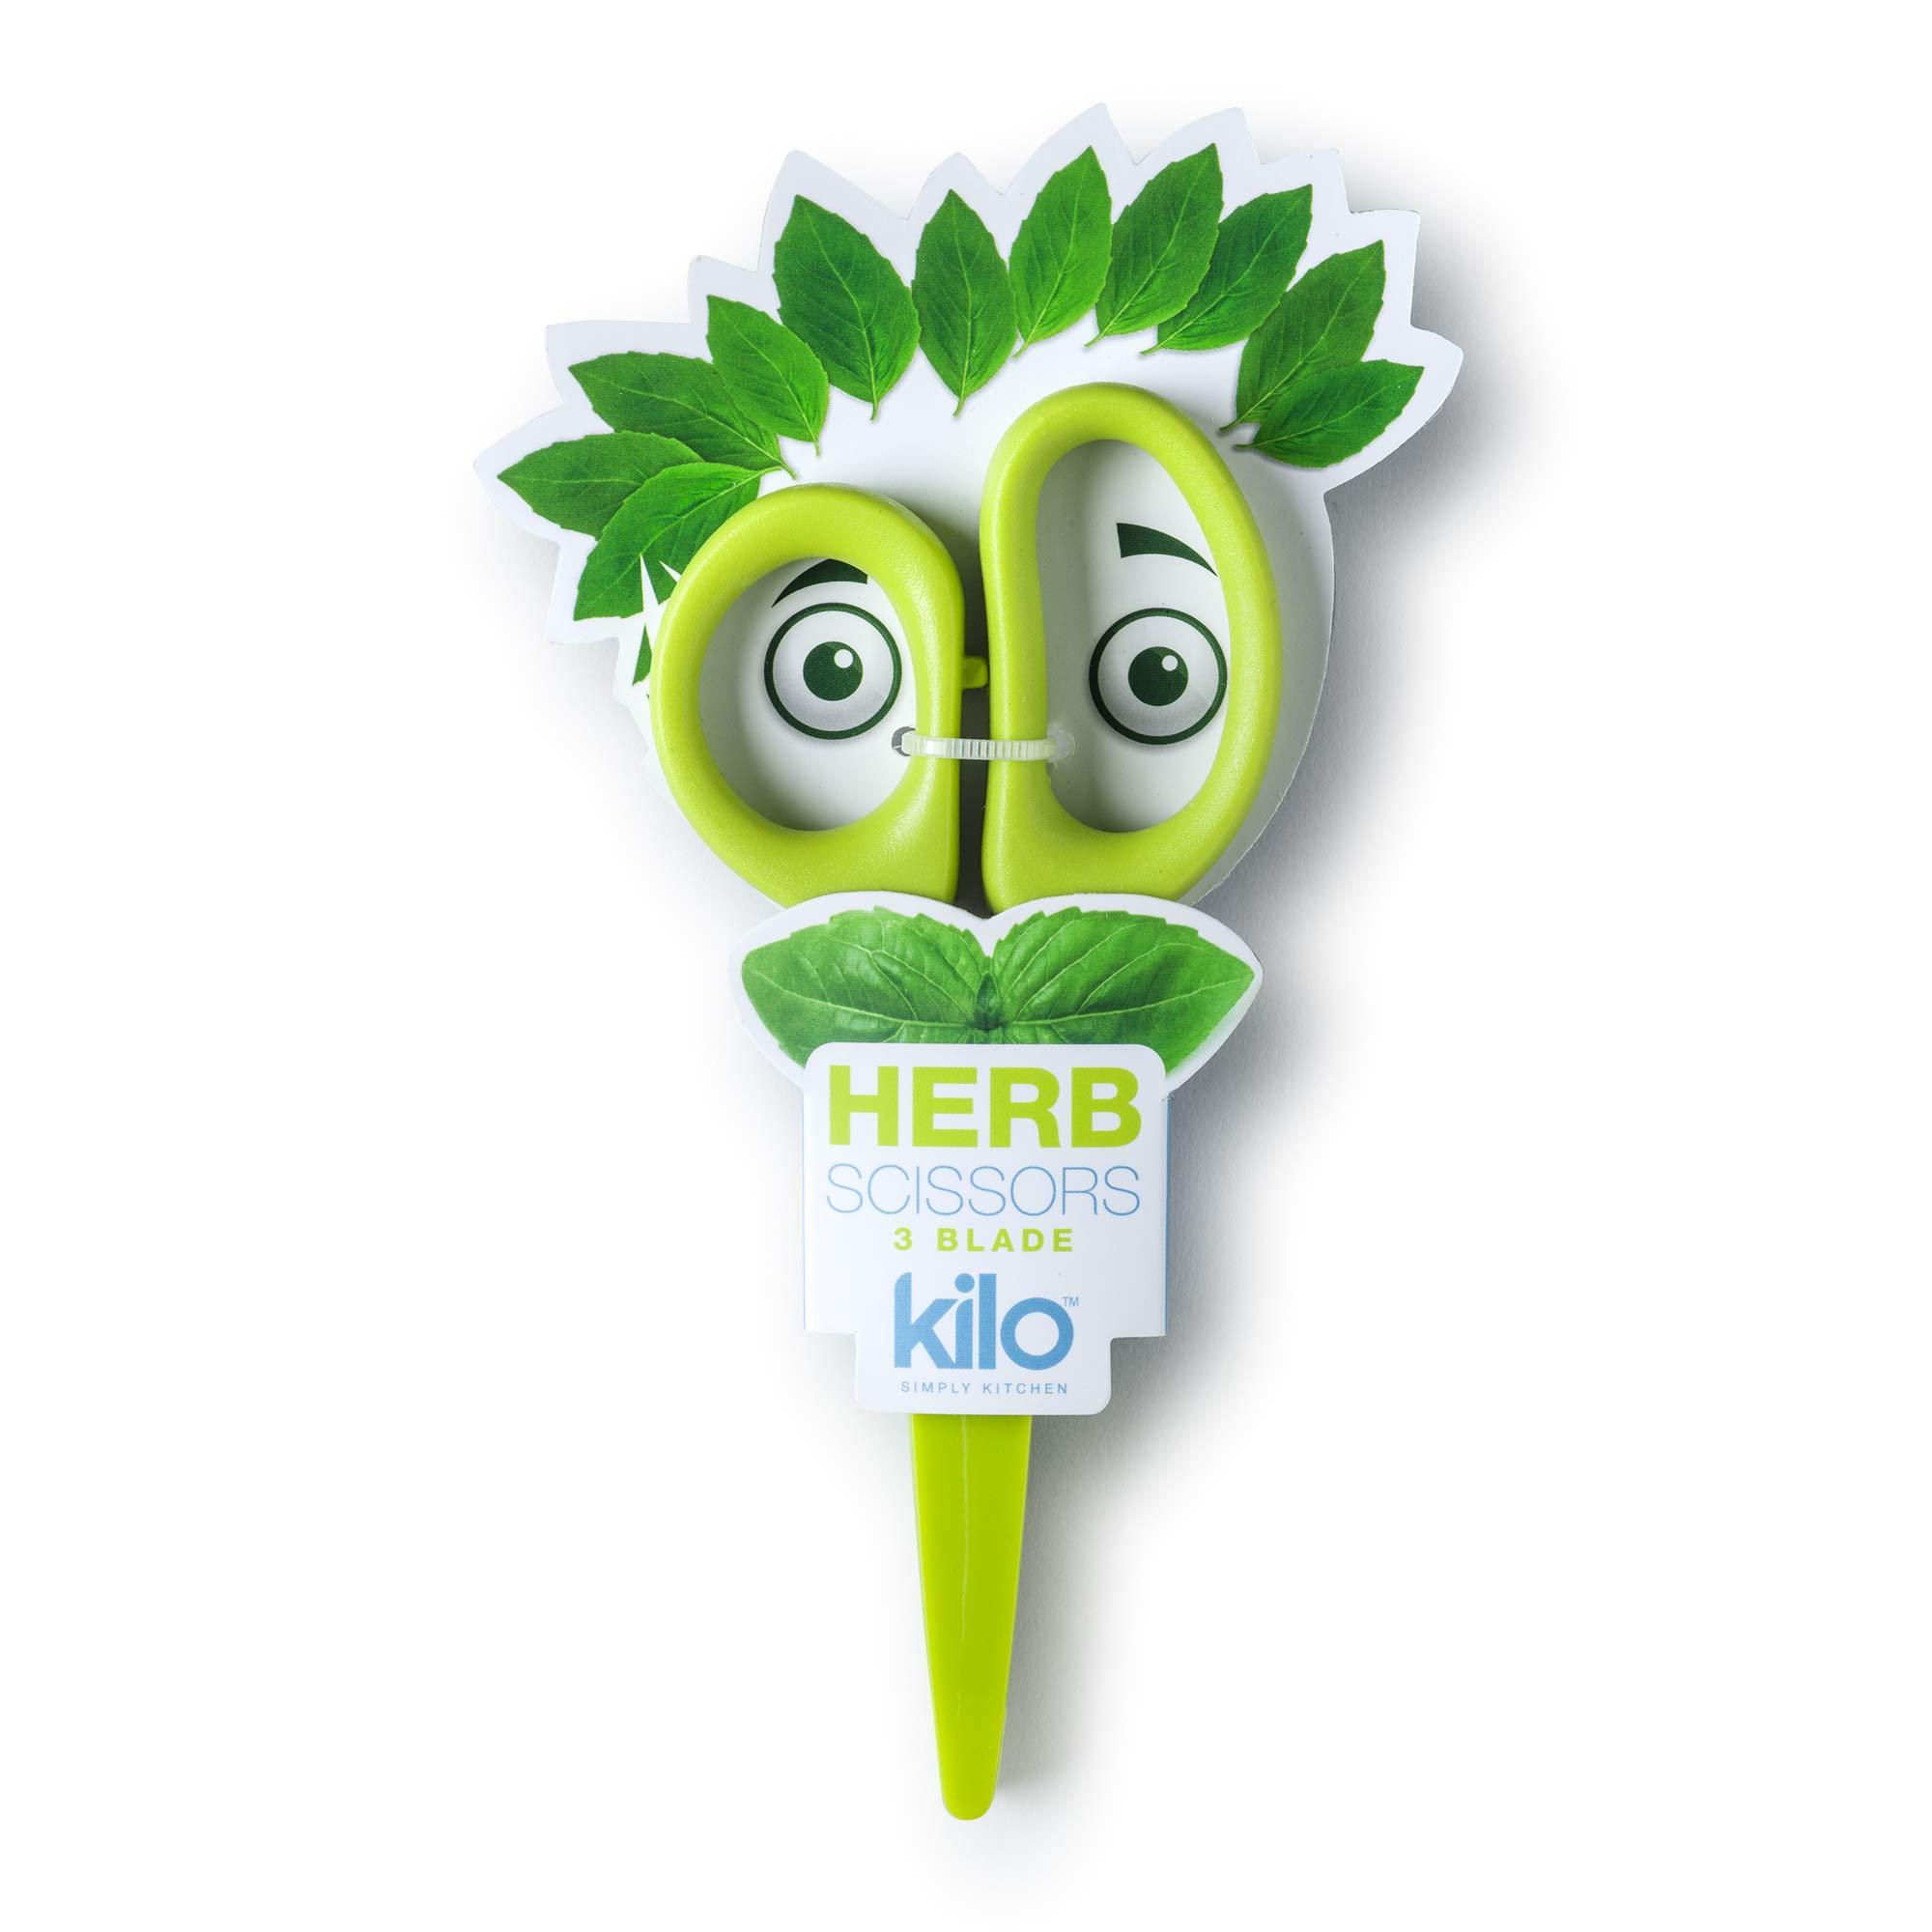 Kilo 3 Blade Mini Herb Scissors